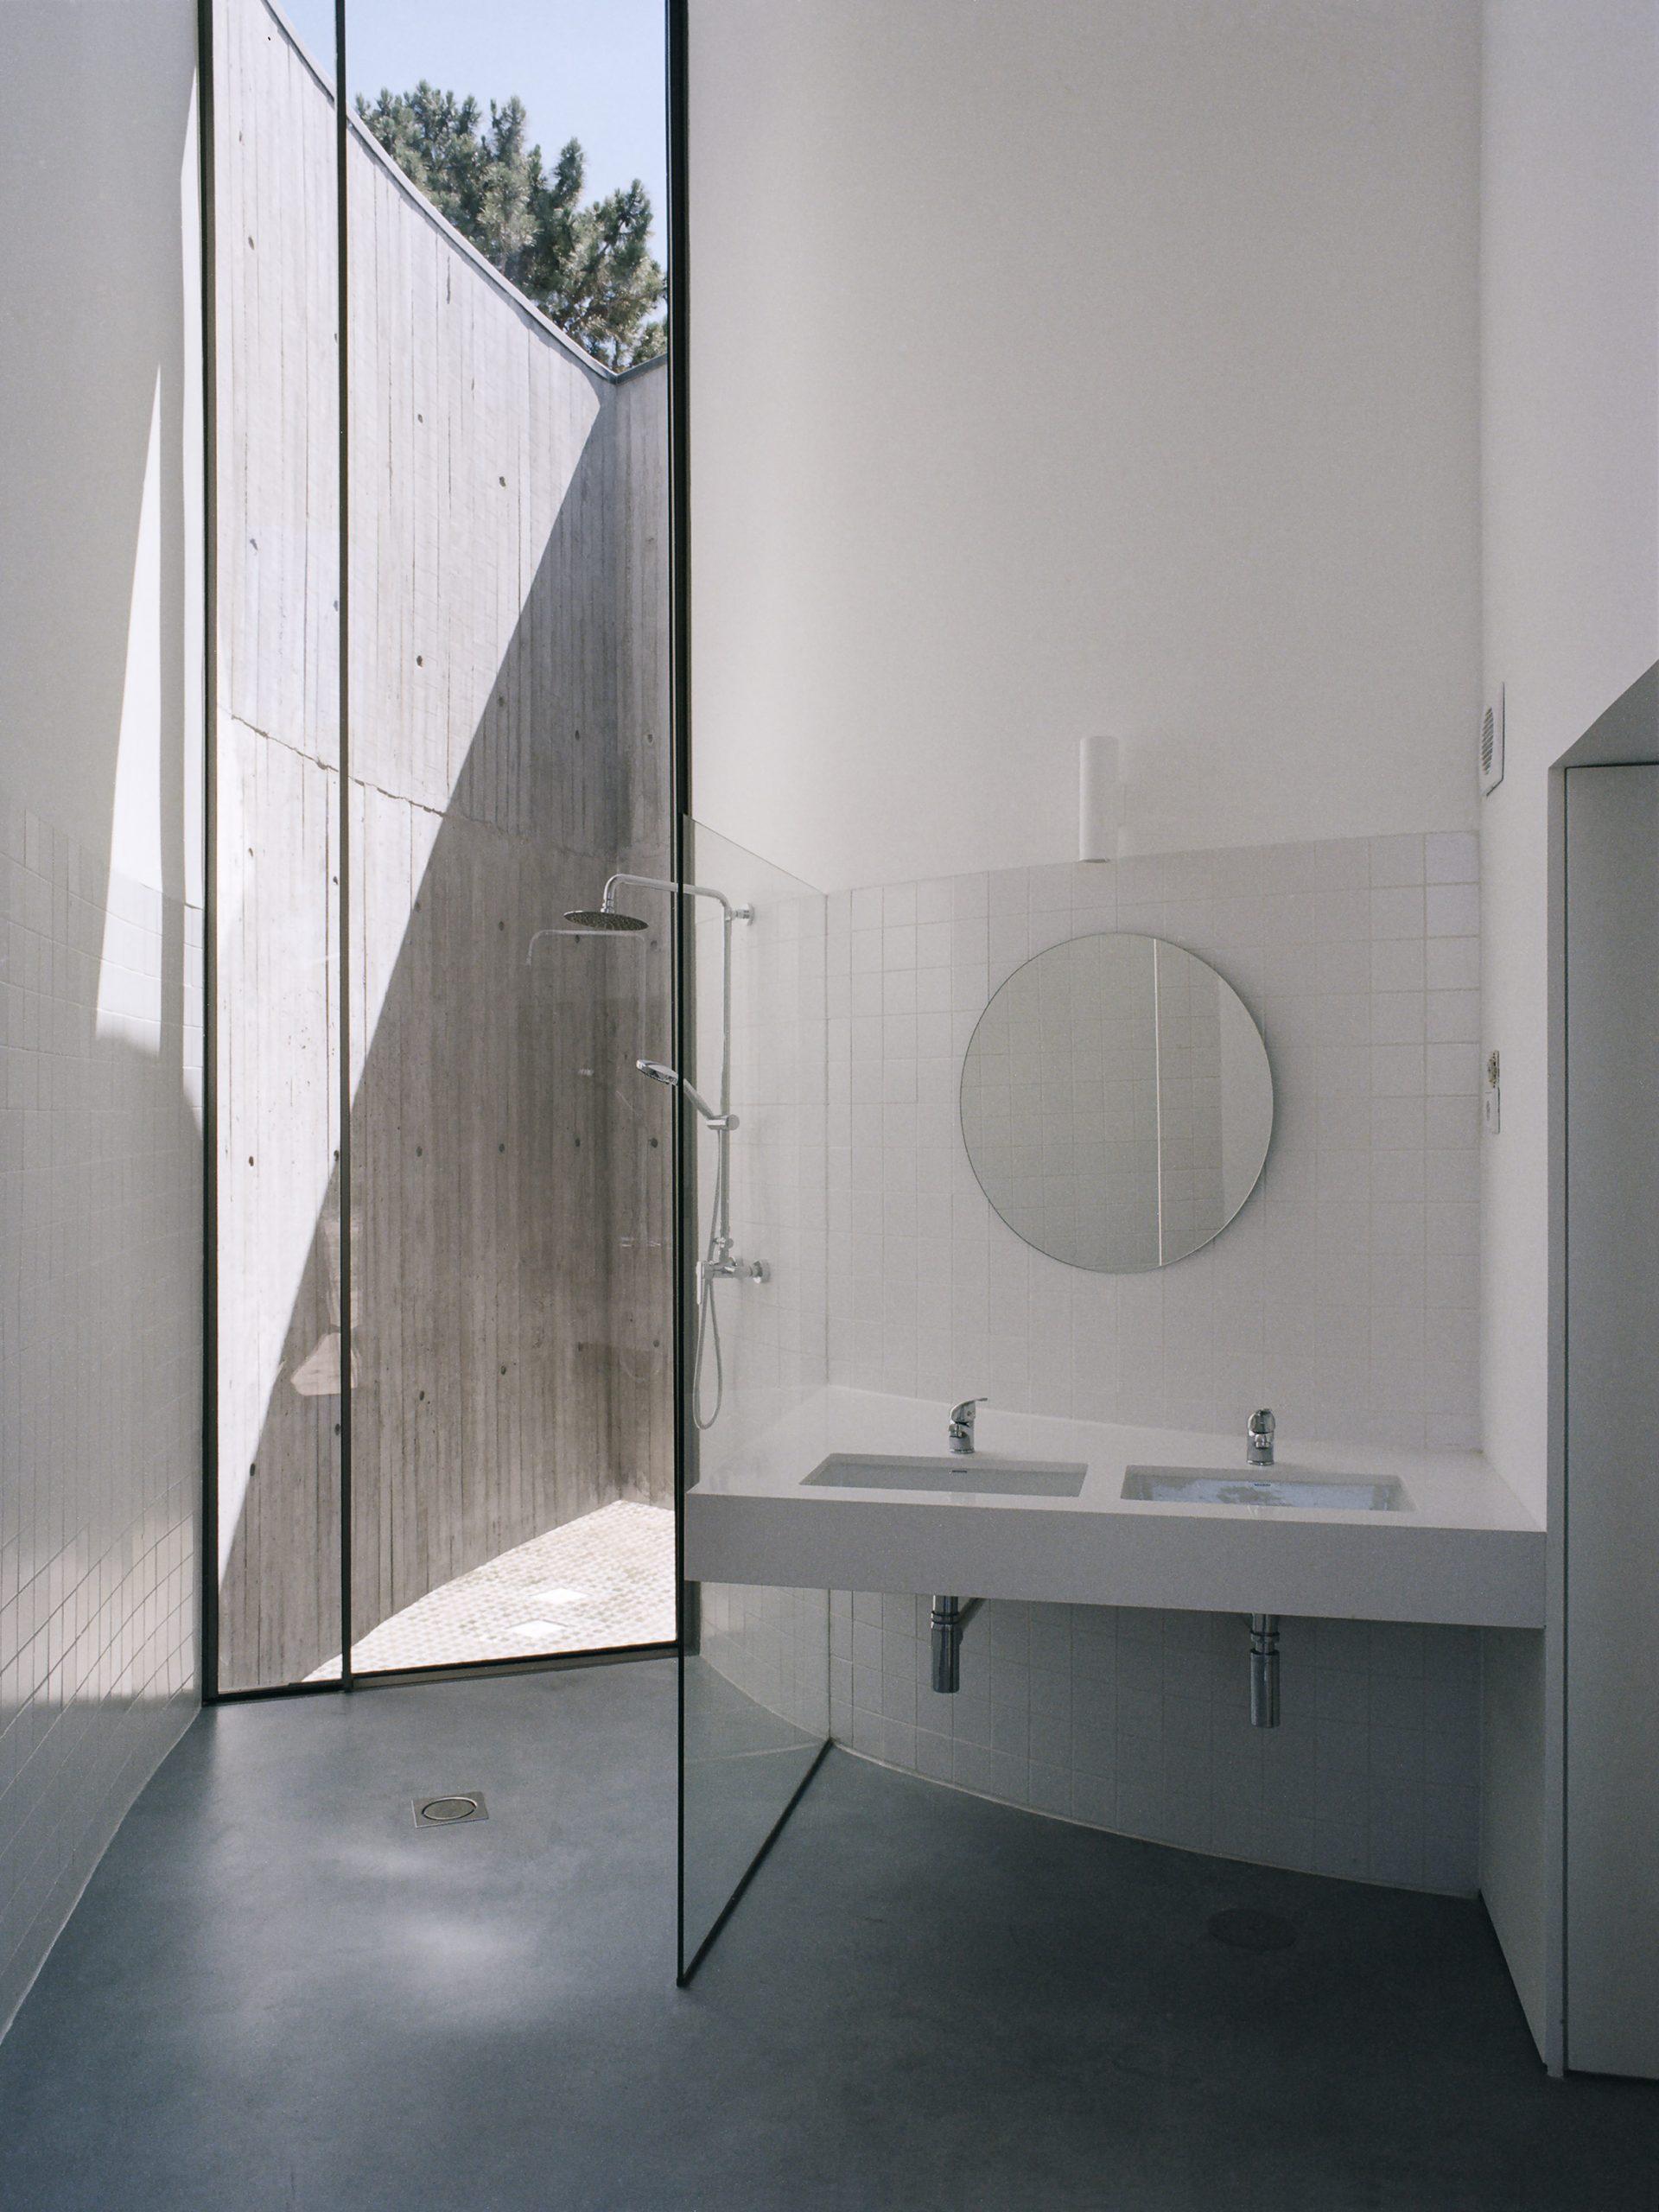 Bathroom of Trefoil House by Double O Studio